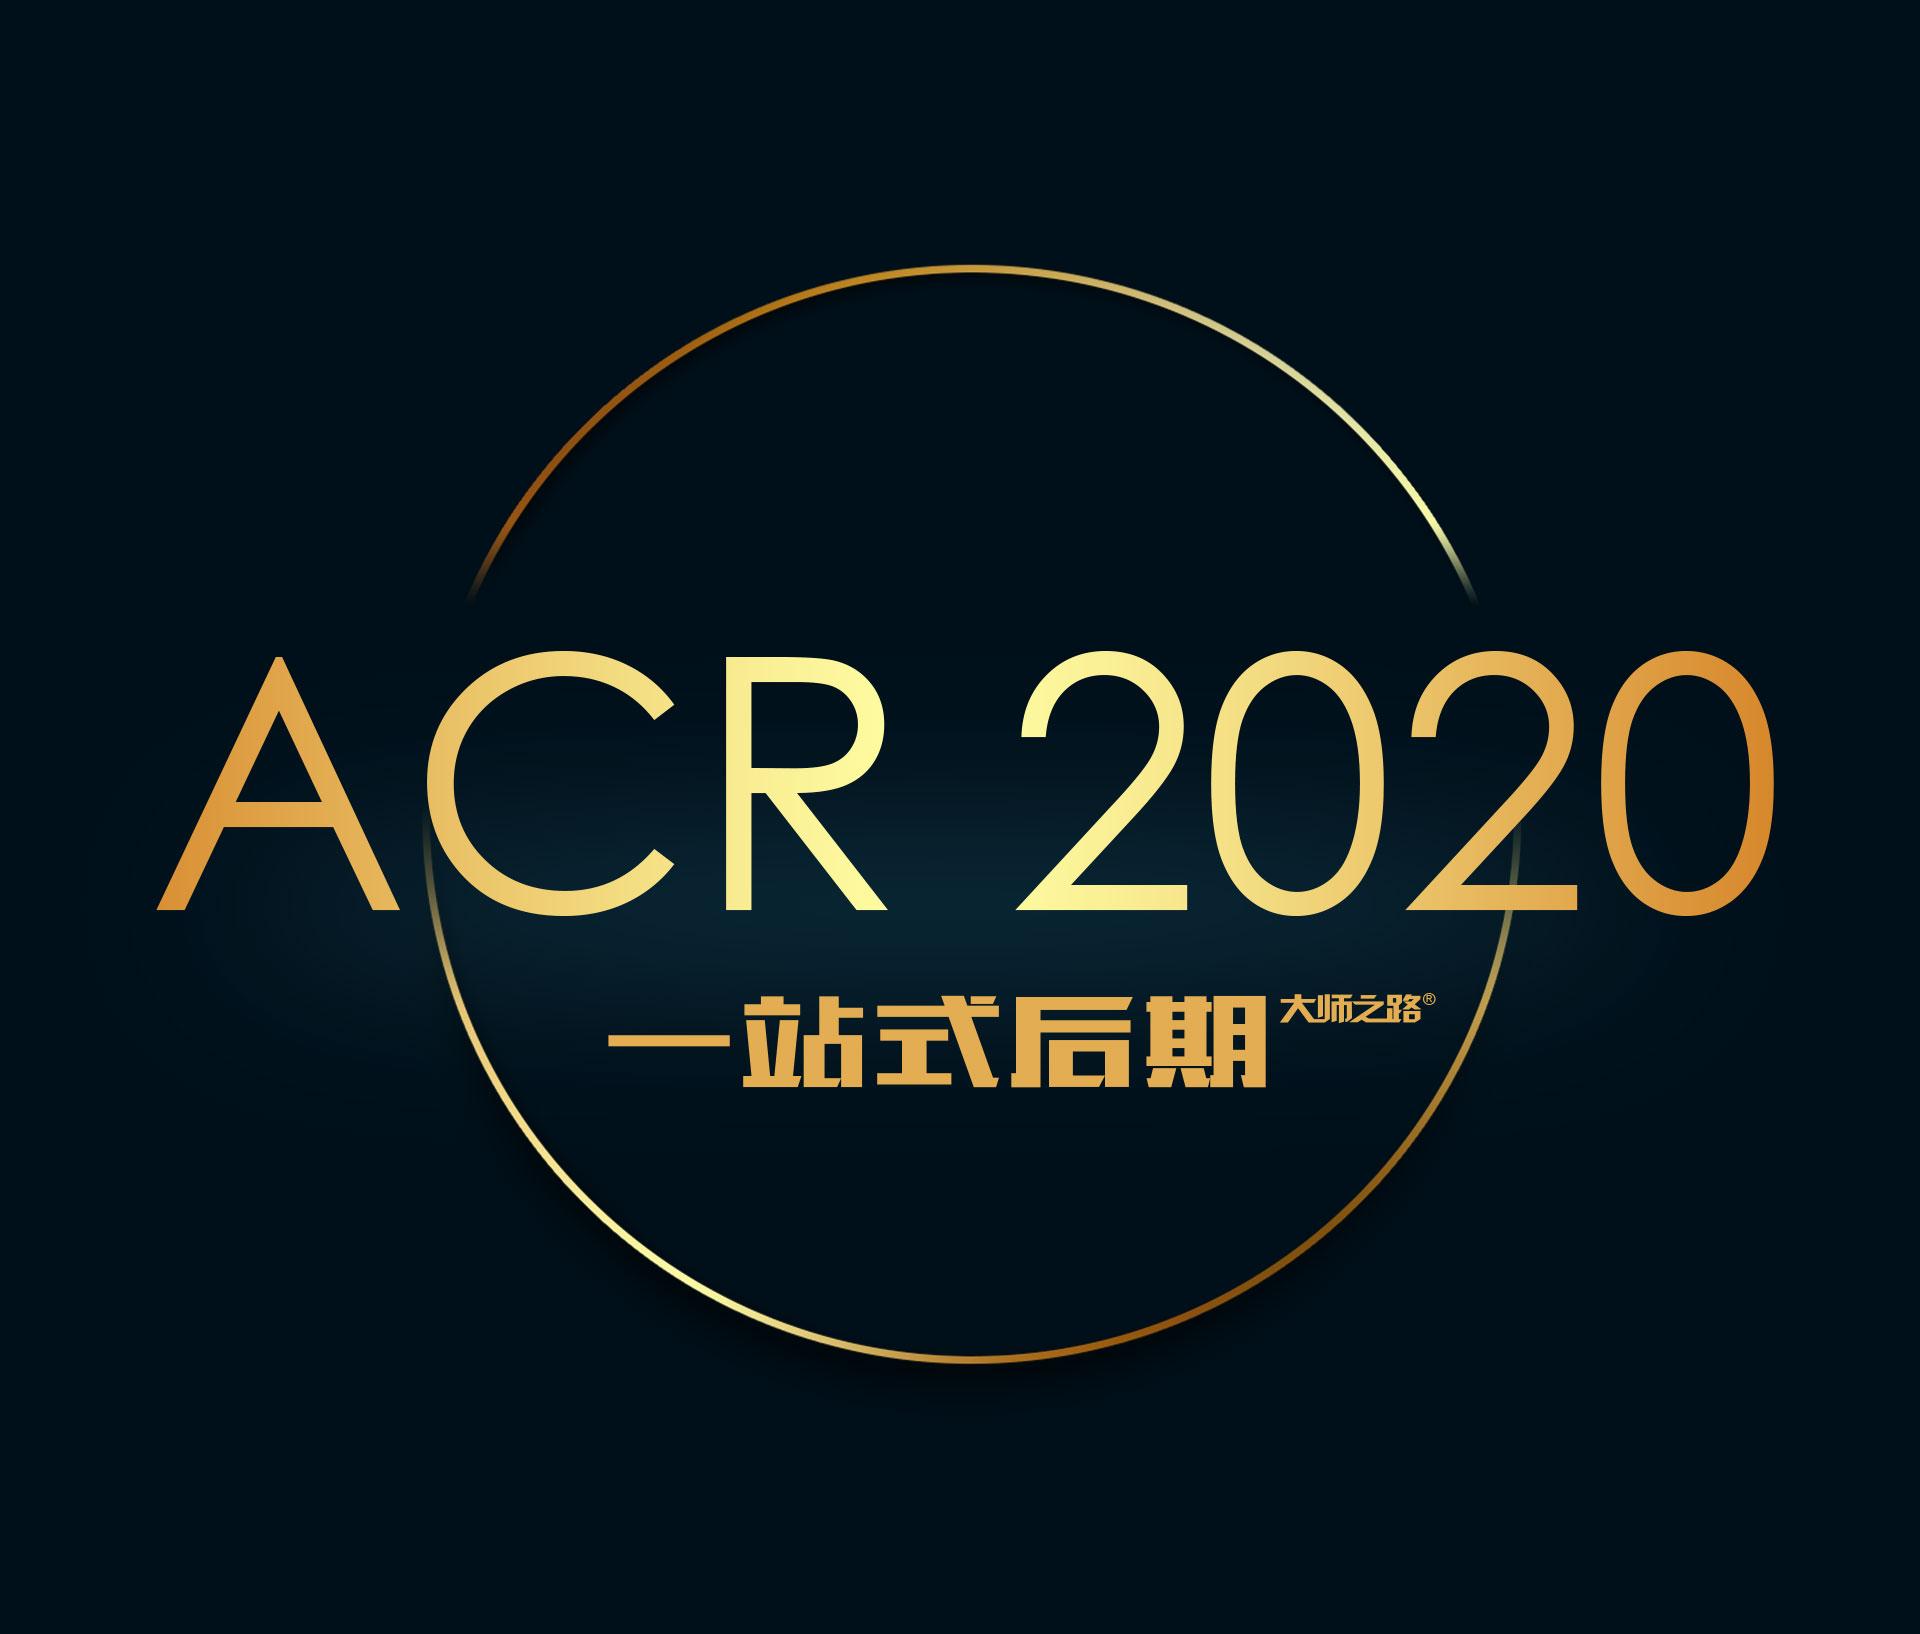 acr2020_detils_mobile_02.jpg